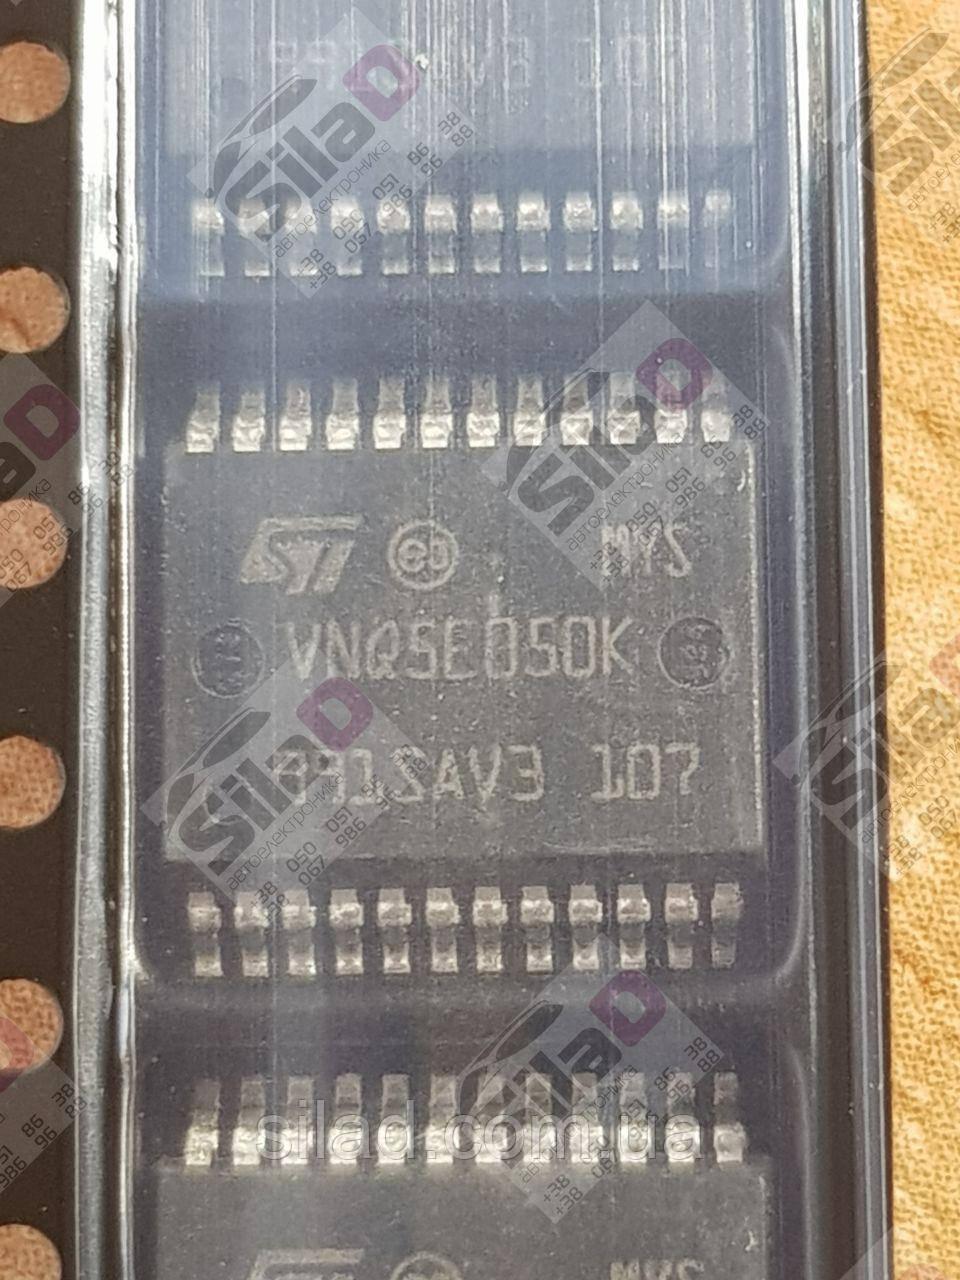 Мікросхема VNQ5E050K STMicroelectronics корпус PowerSSO-24 4-Channel 4,5-28V 27A